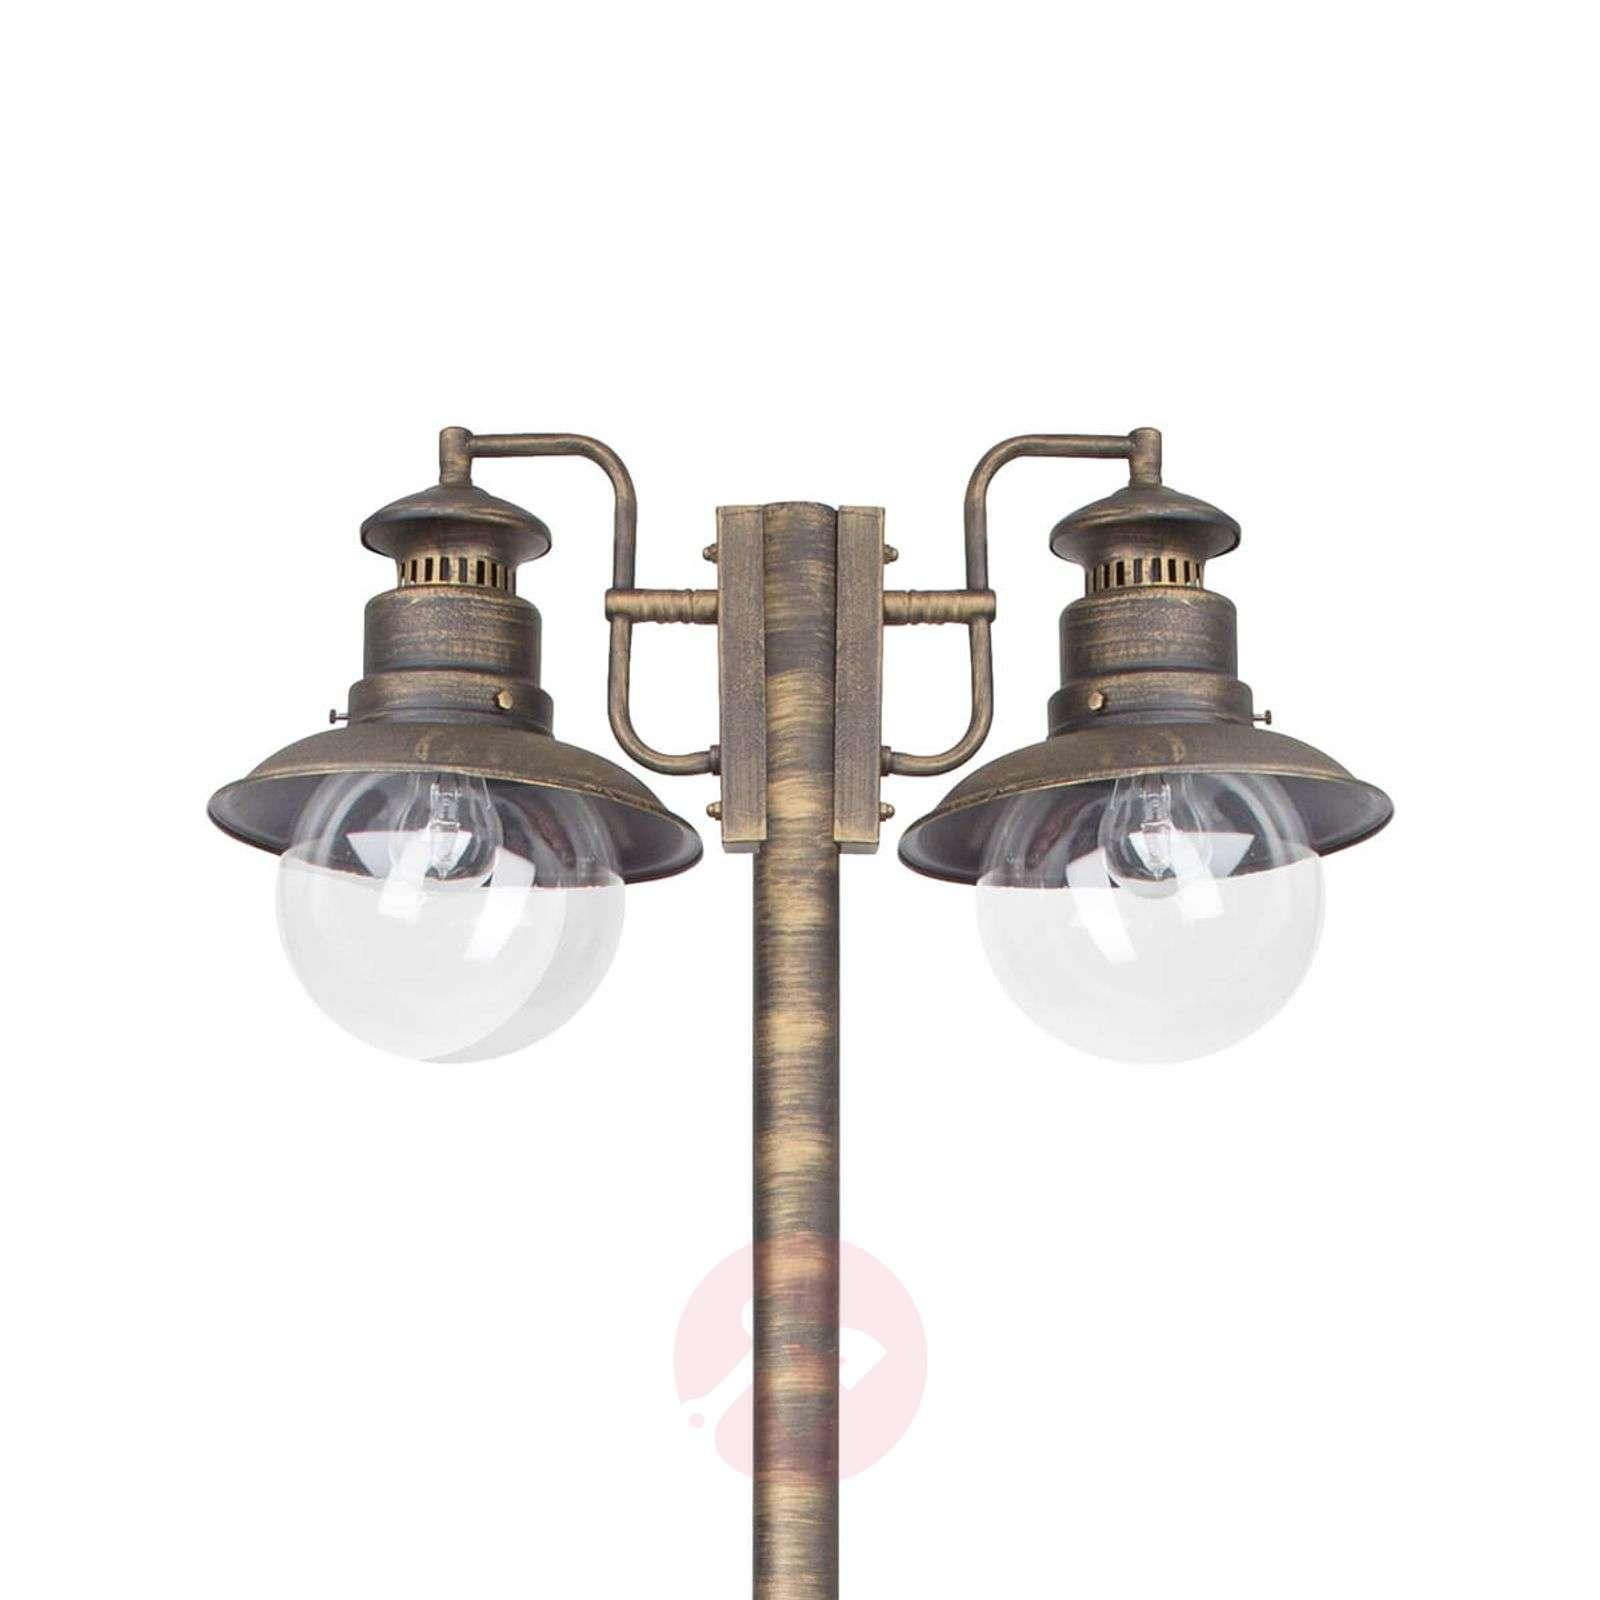 Artu two-bulb post light in black/gold-1507156-01